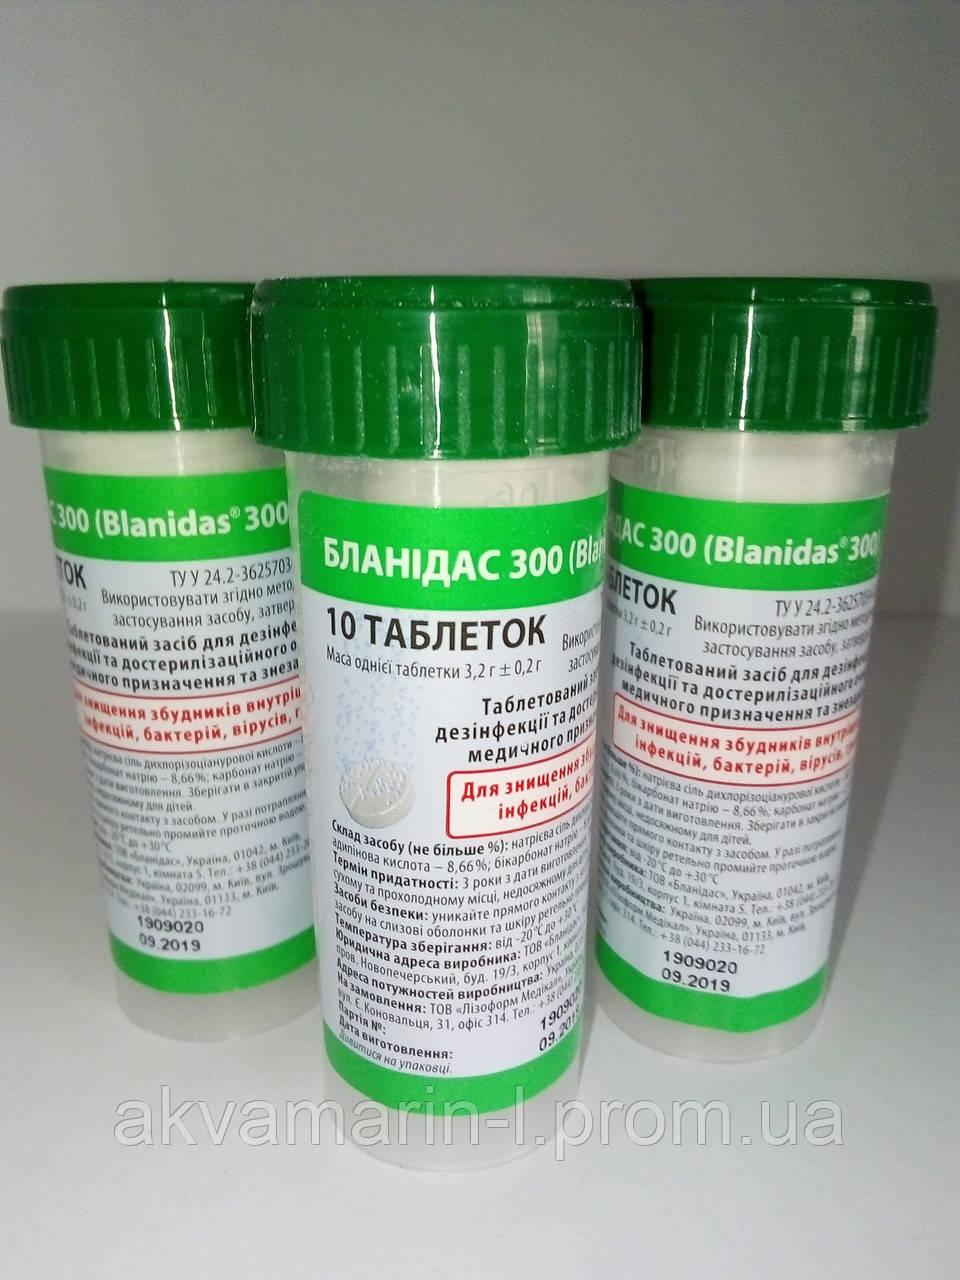 Таблетки Бланидас 300, 1 уп. (10 табл.) дезинфицирующее средство